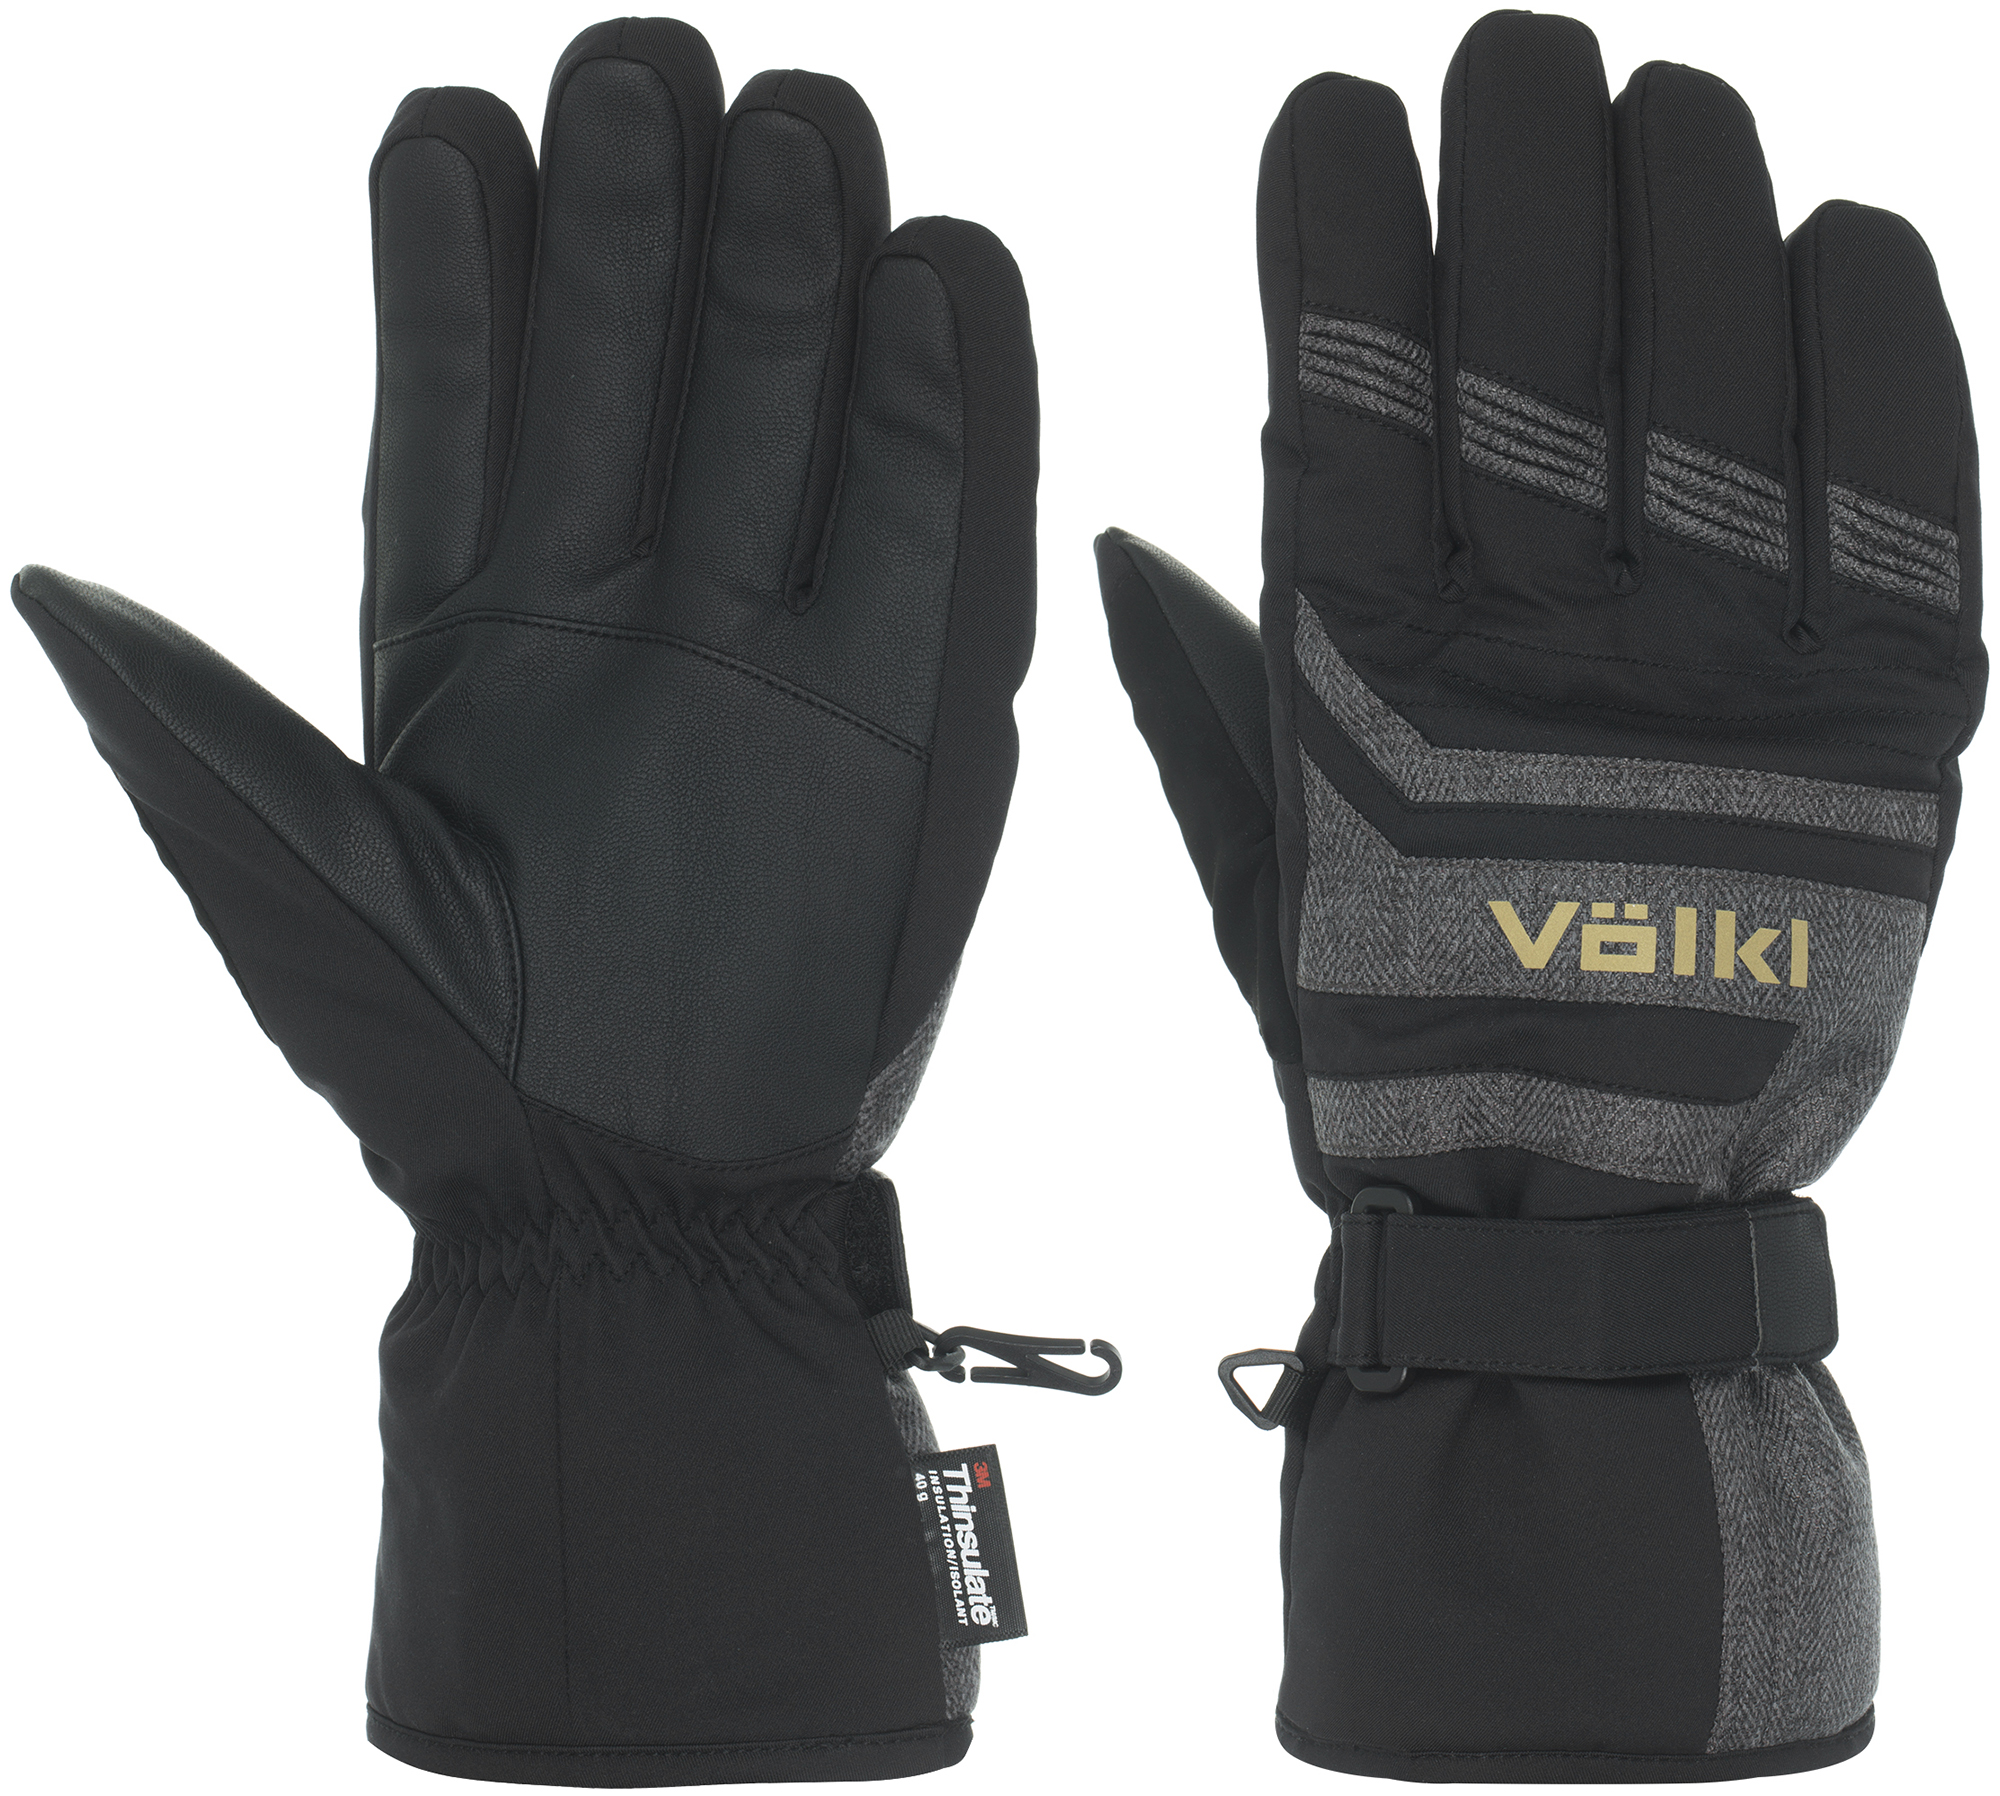 Volkl Перчатки мужские Volkl, размер 10